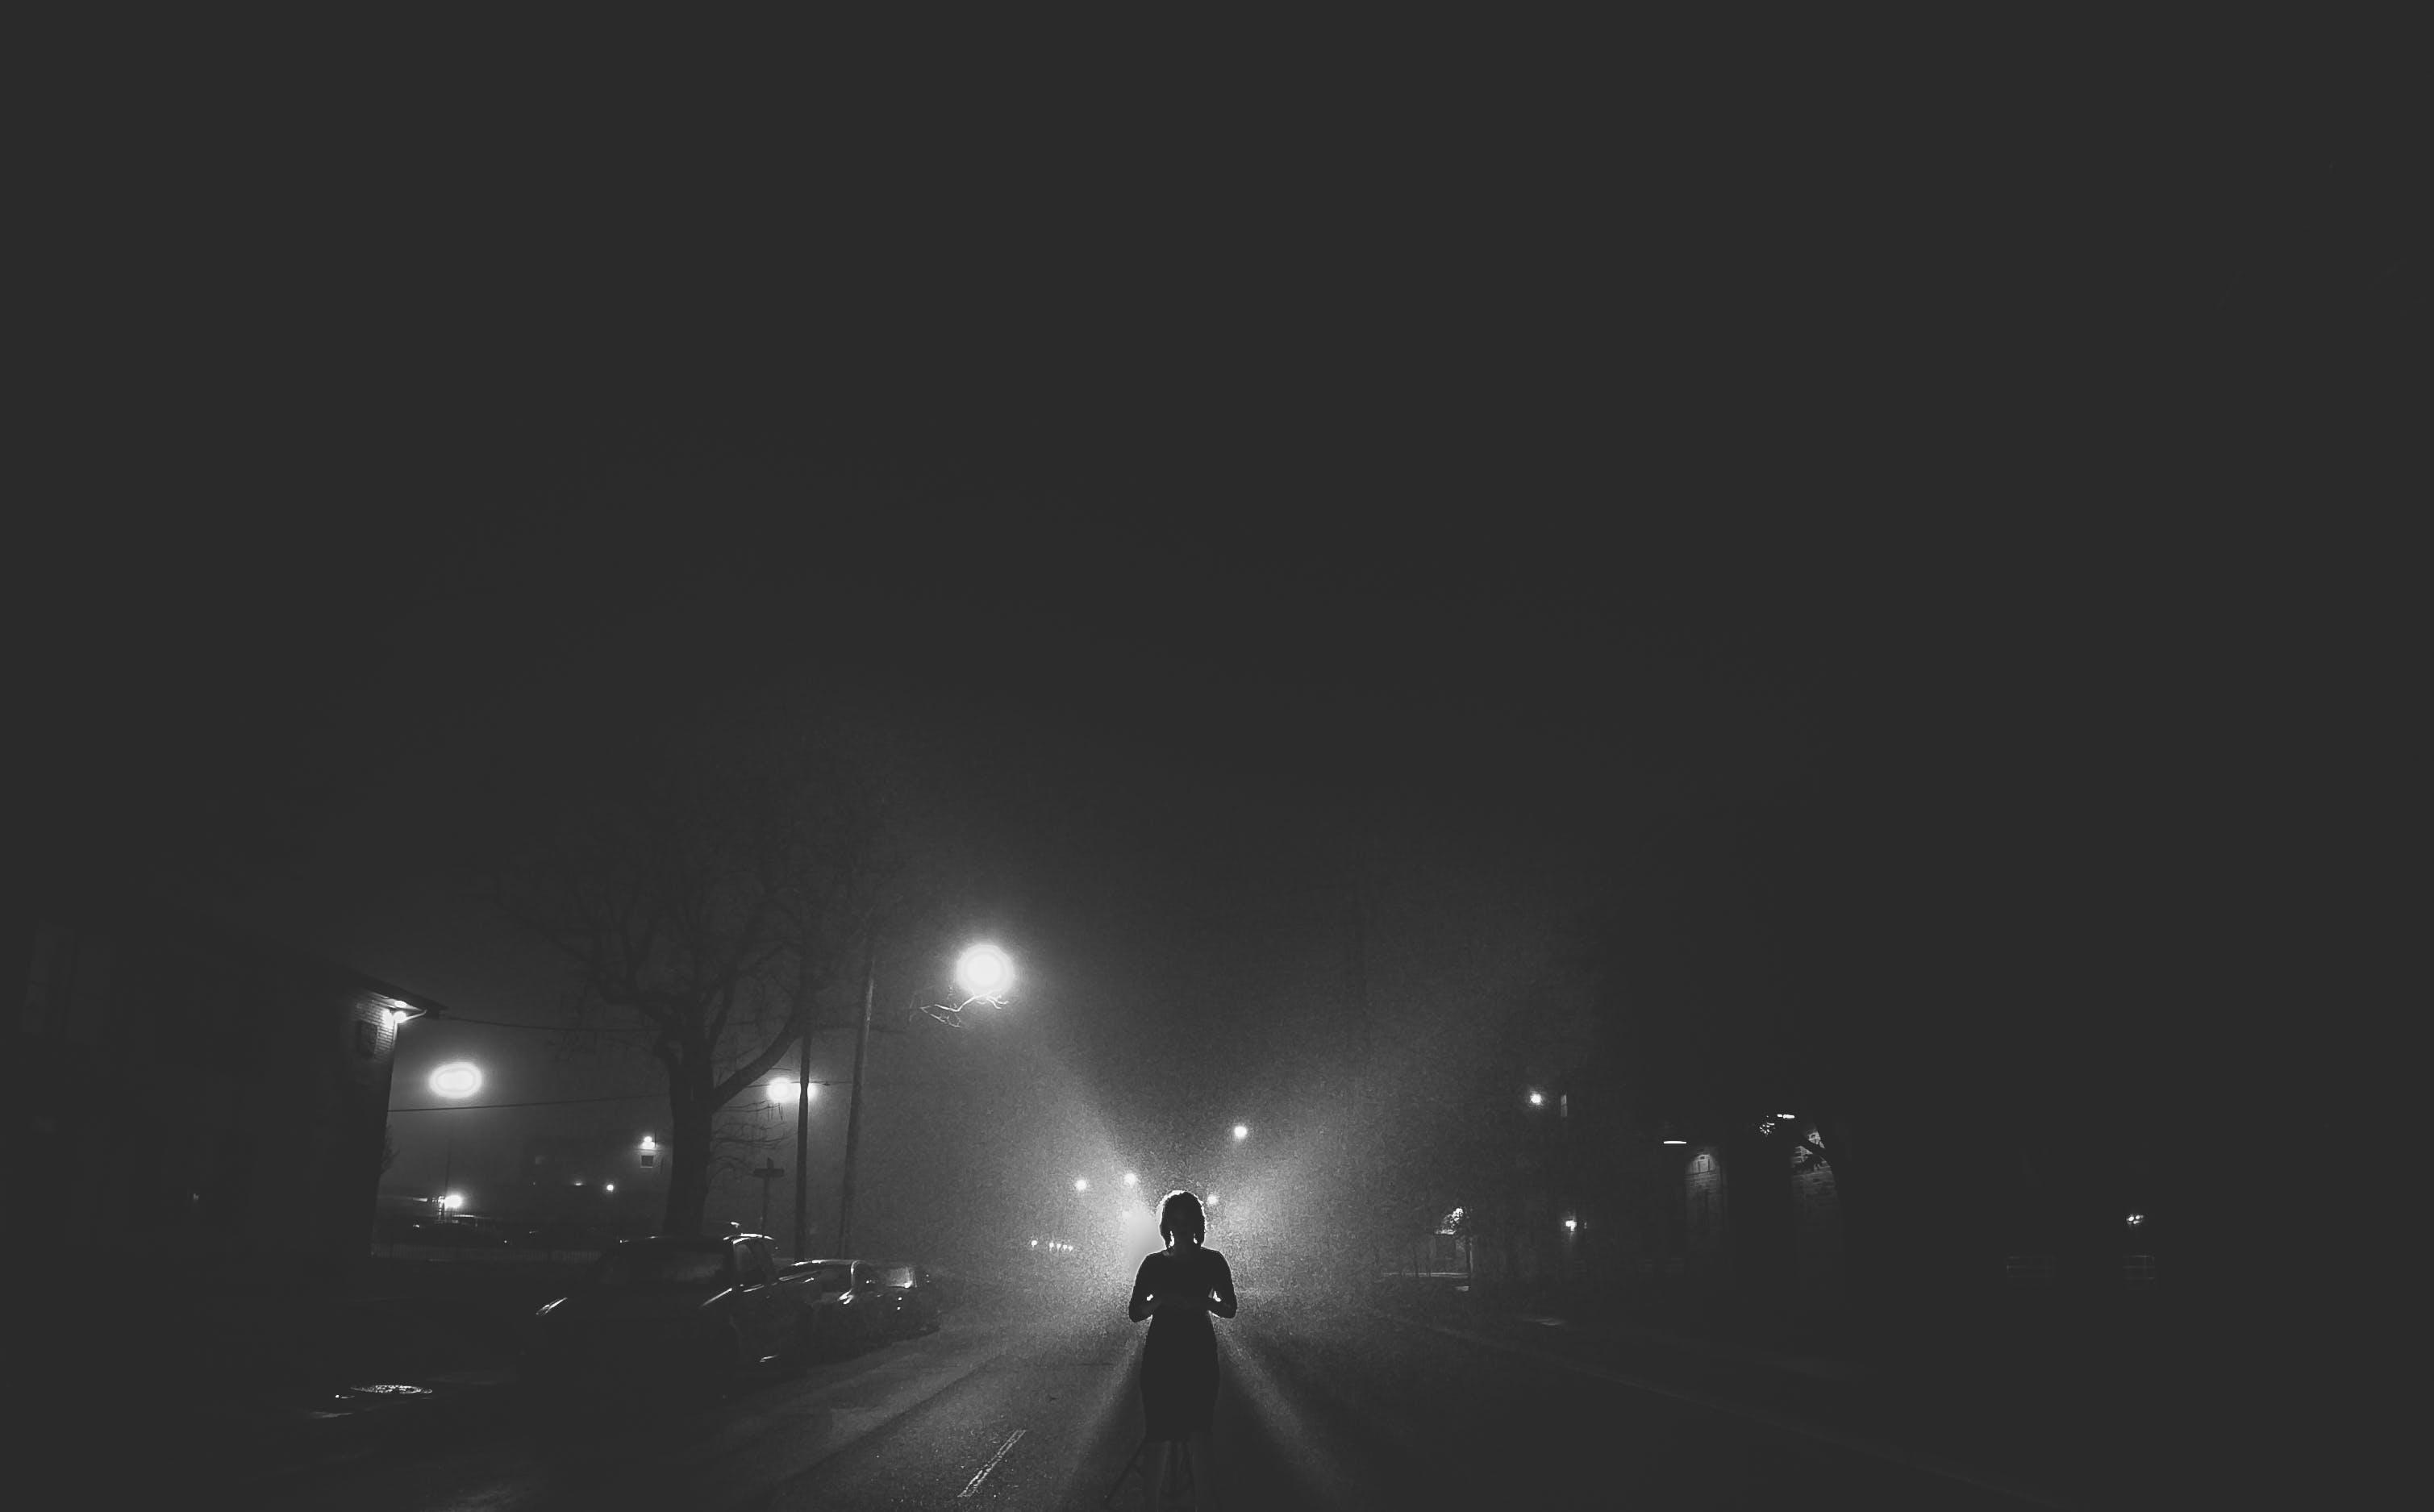 Free stock photo of angel, beautiful, city at night, cute